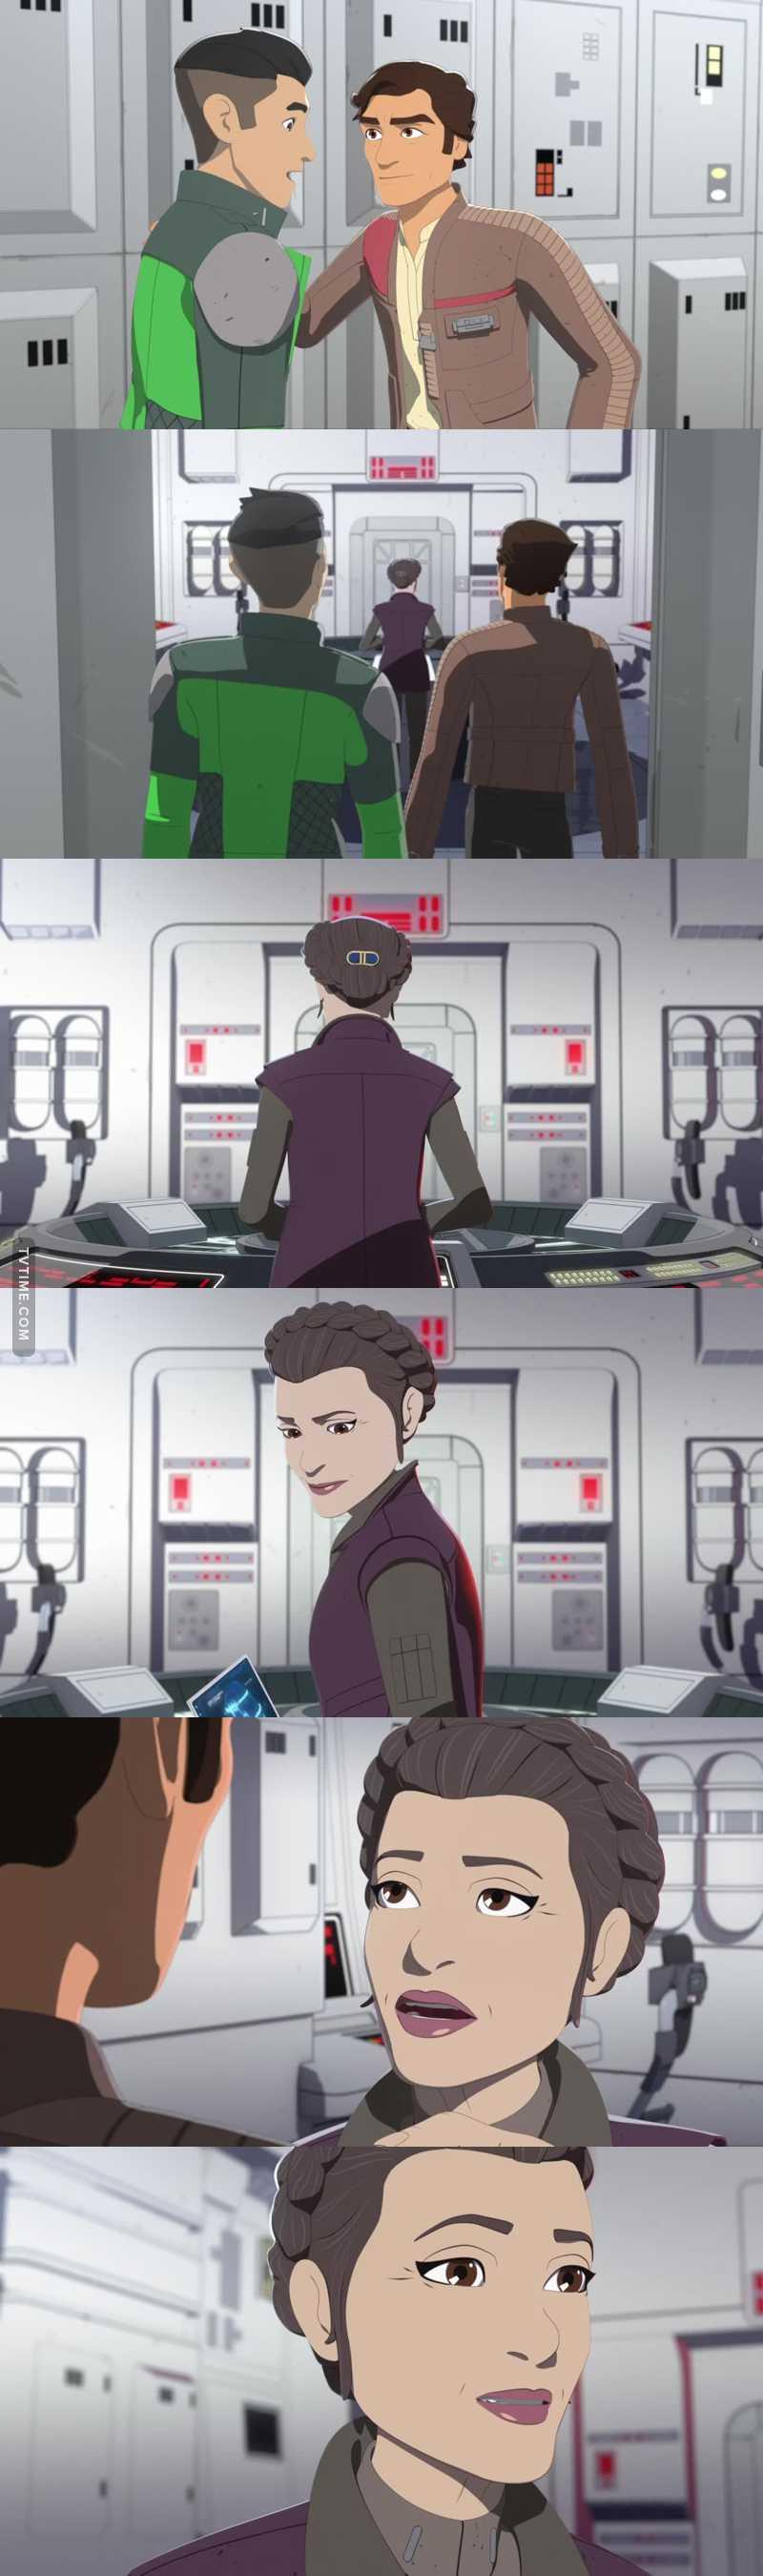 General Leia Organa! <3